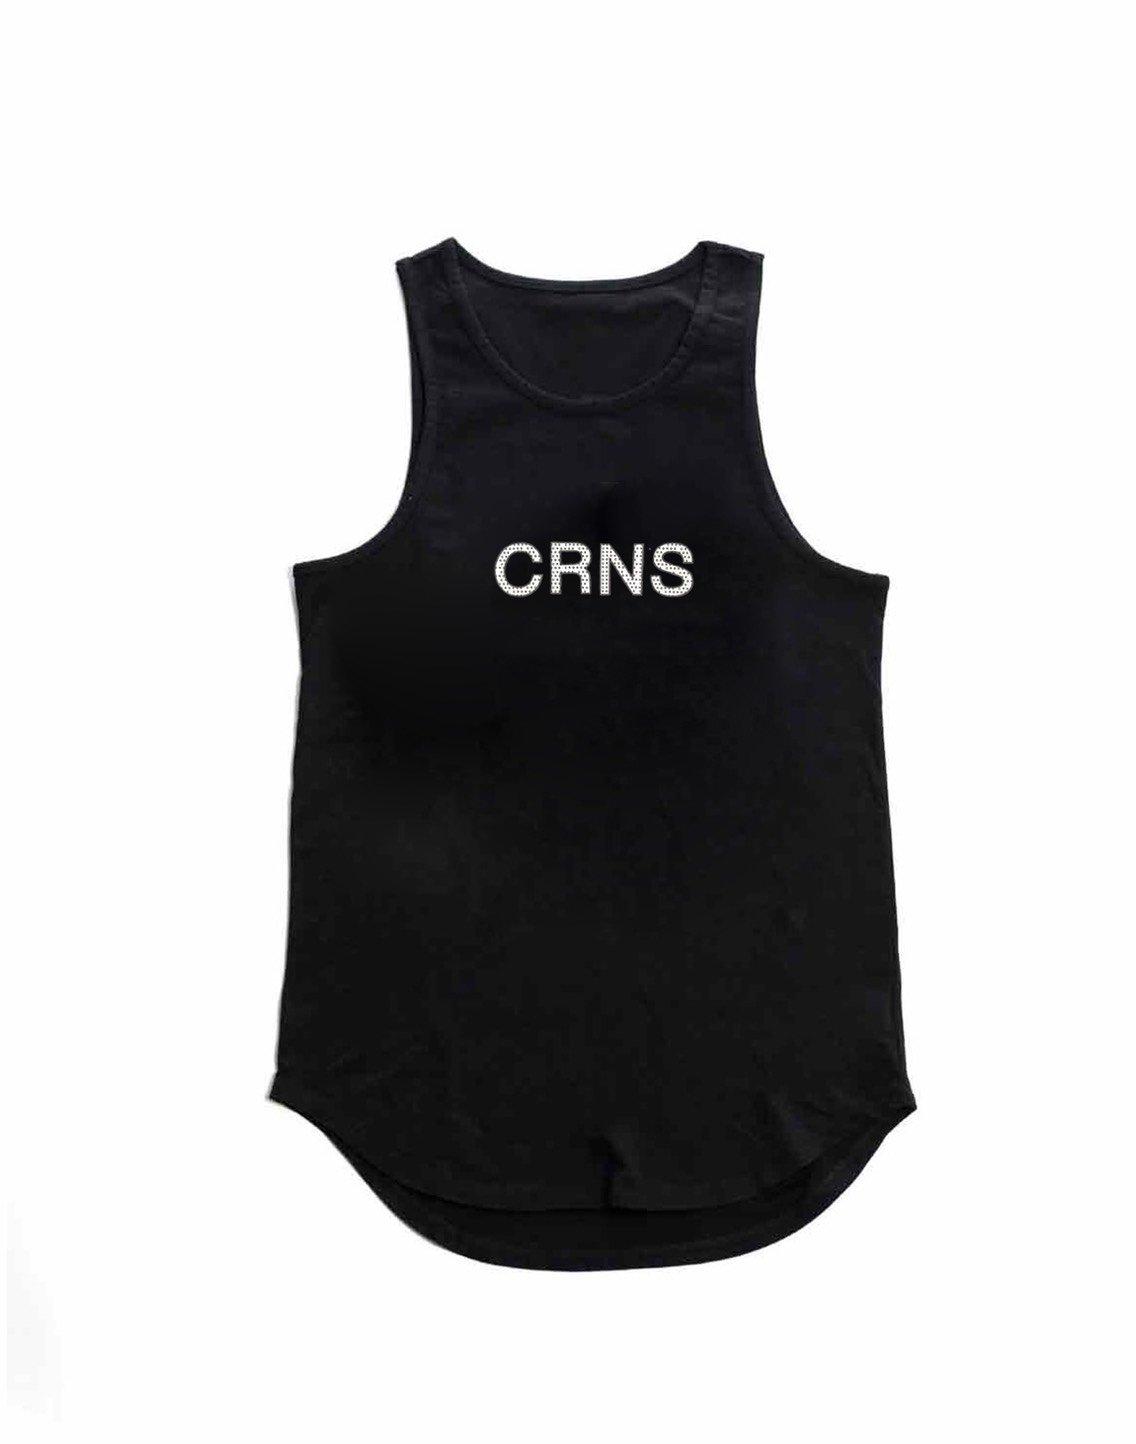 CRNS DOT LOGO TANK TOP【BLACK】